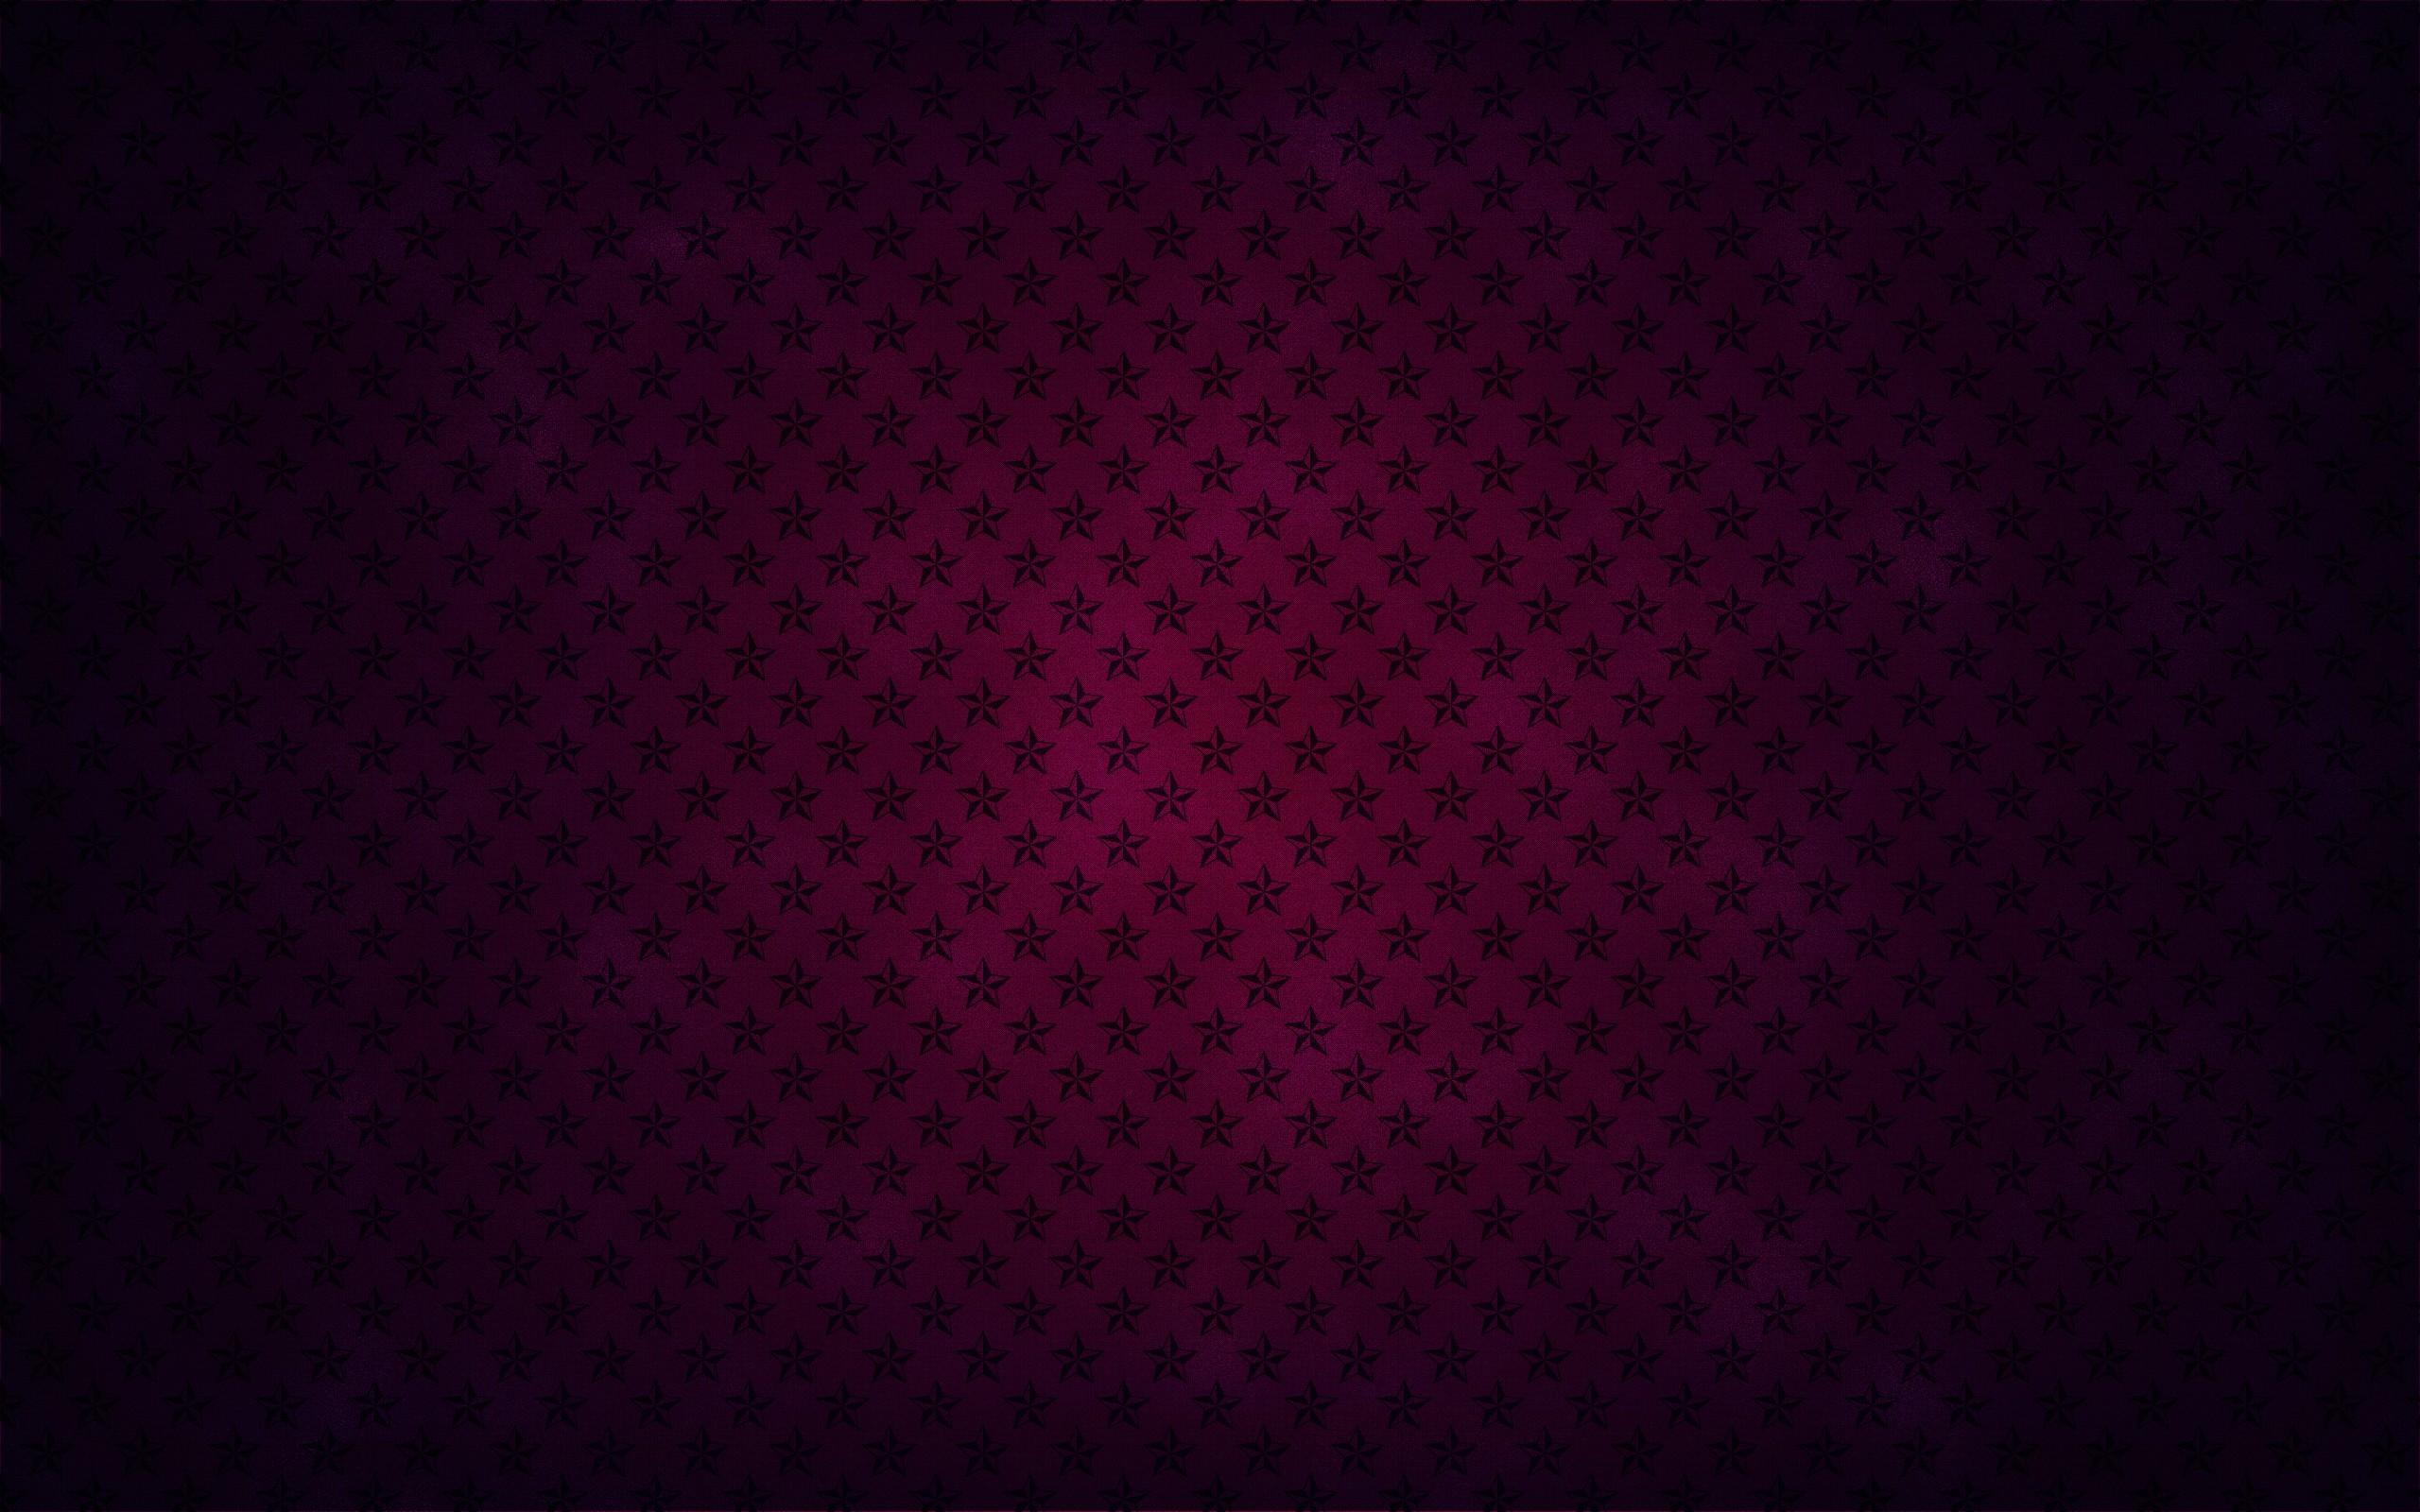 wallpaper.wiki-Plain-dark-pink-pictures-PIC-WPB0010635